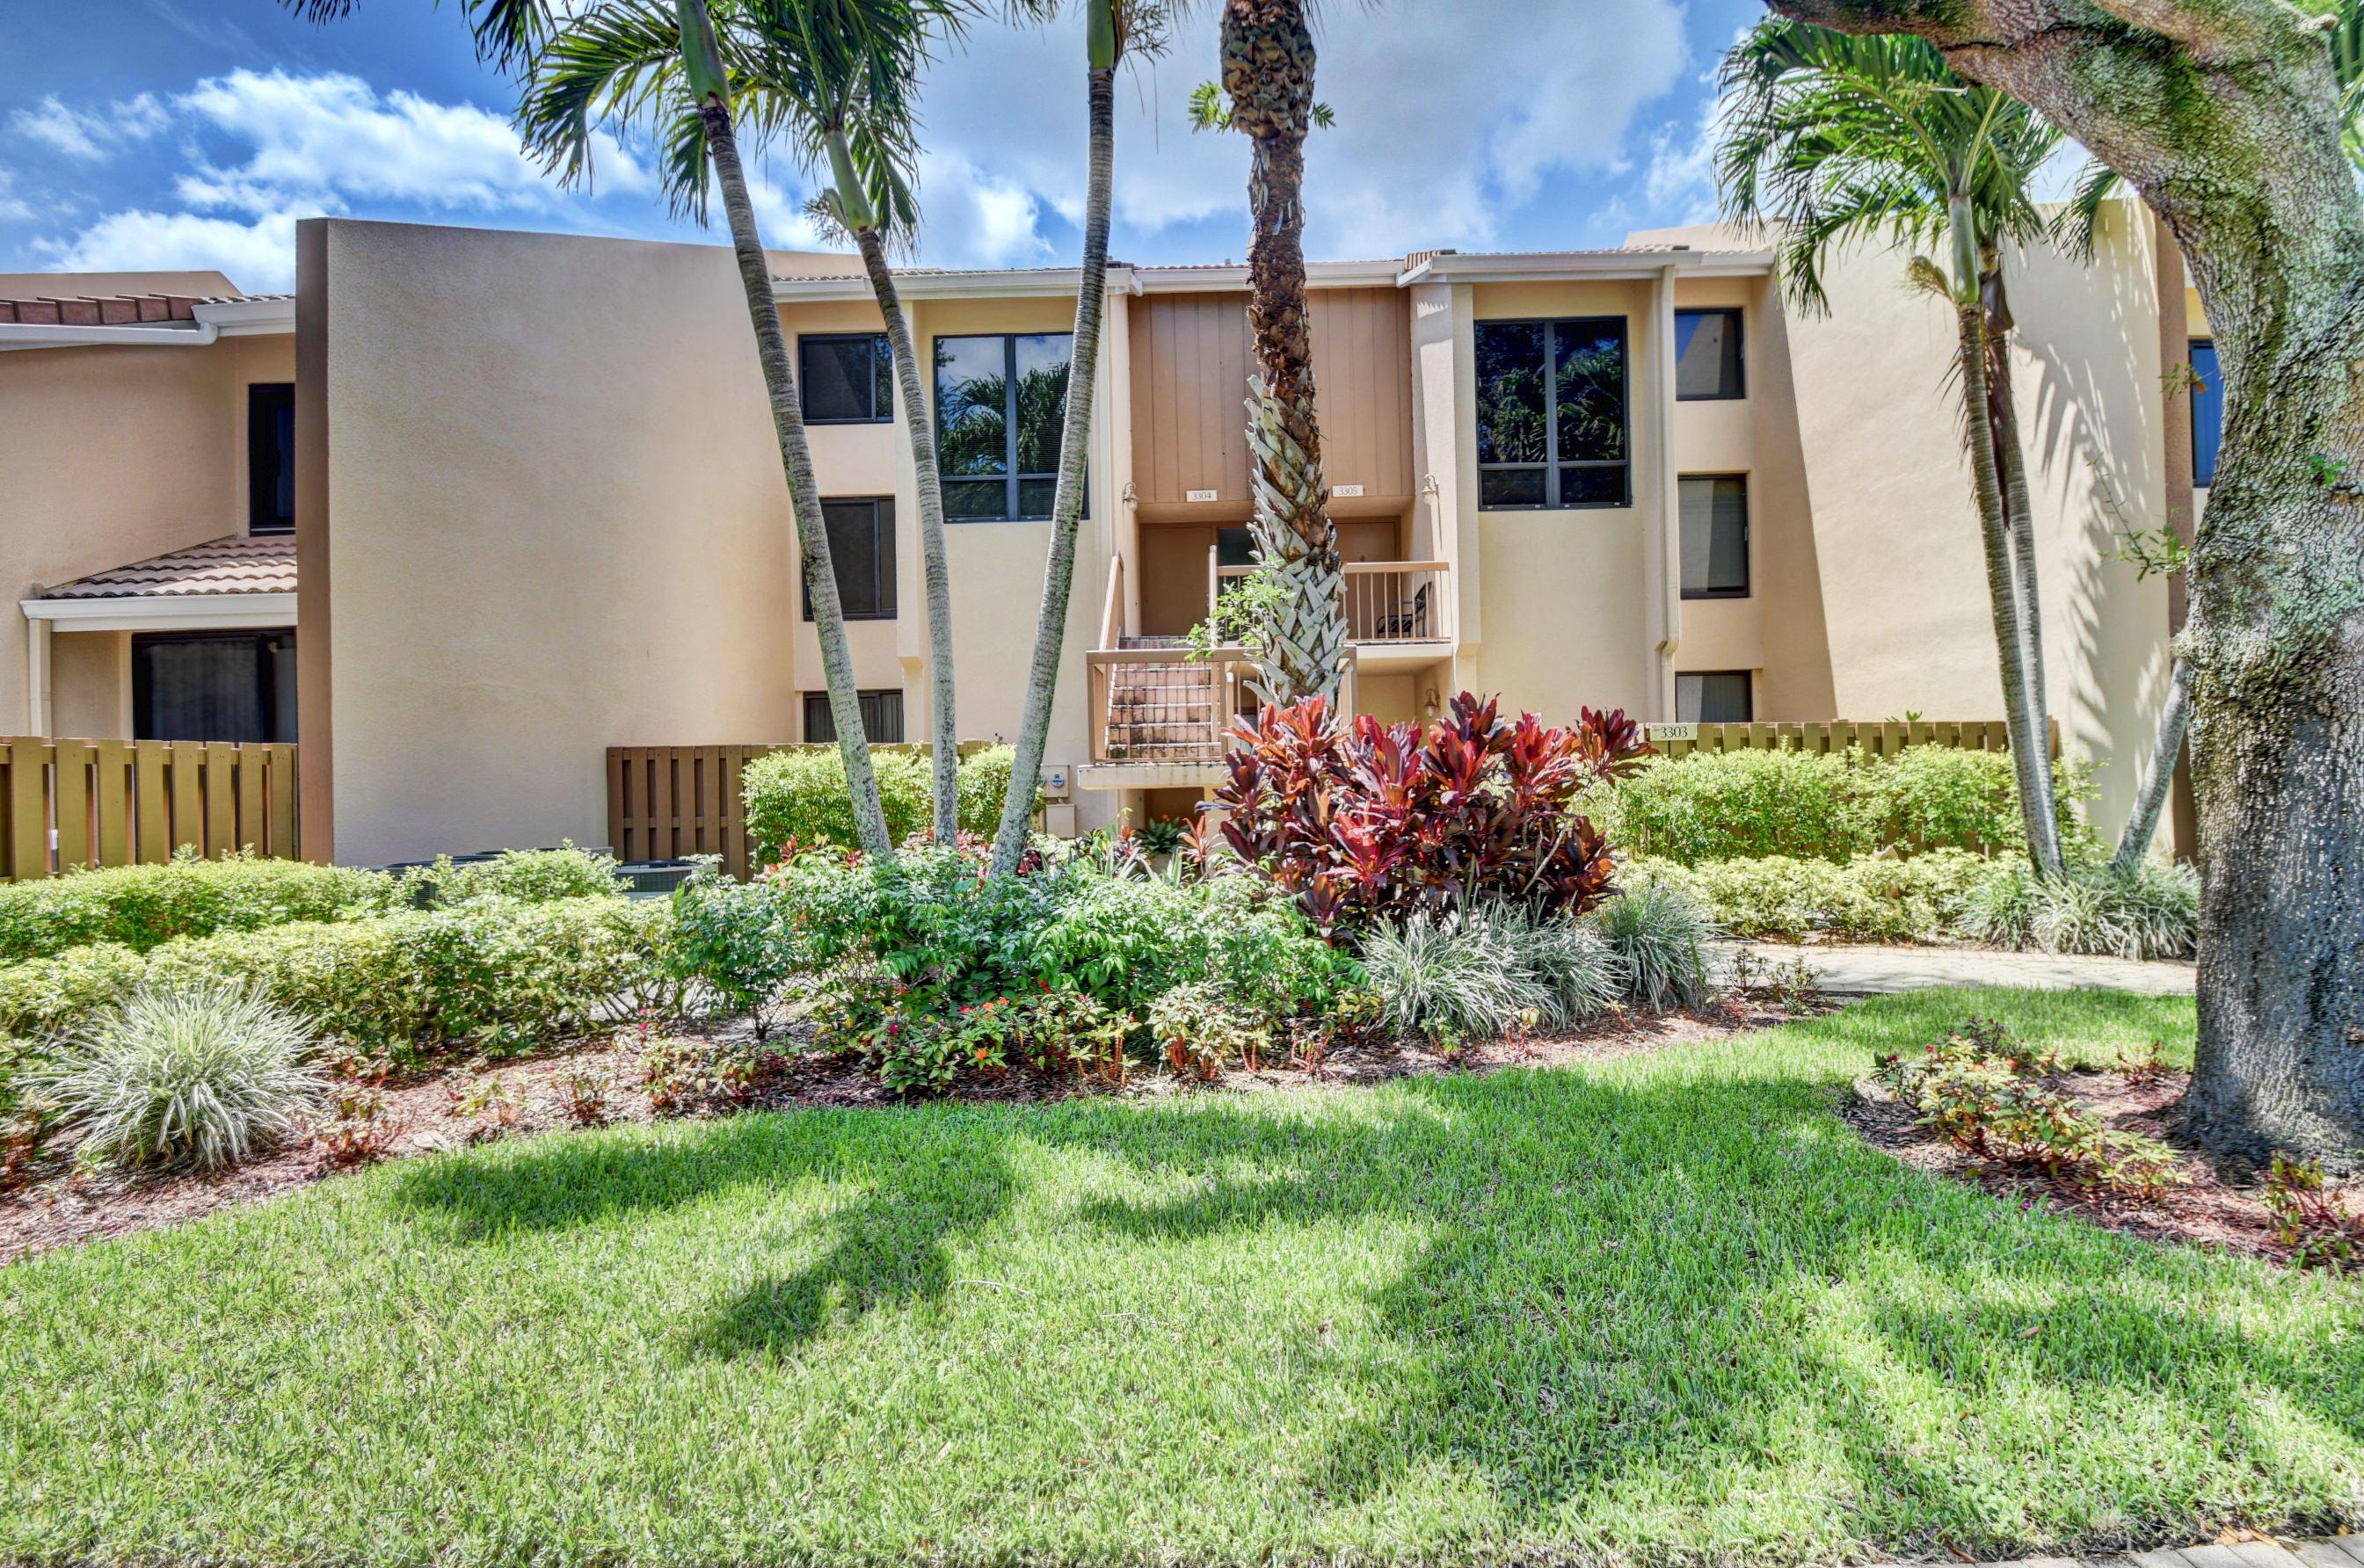 3303 Bridgewood Drive, Boca Raton, Florida 33434, 2 Bedrooms Bedrooms, ,2 BathroomsBathrooms,Residential,For Sale,Bridgewood,RX-10527718